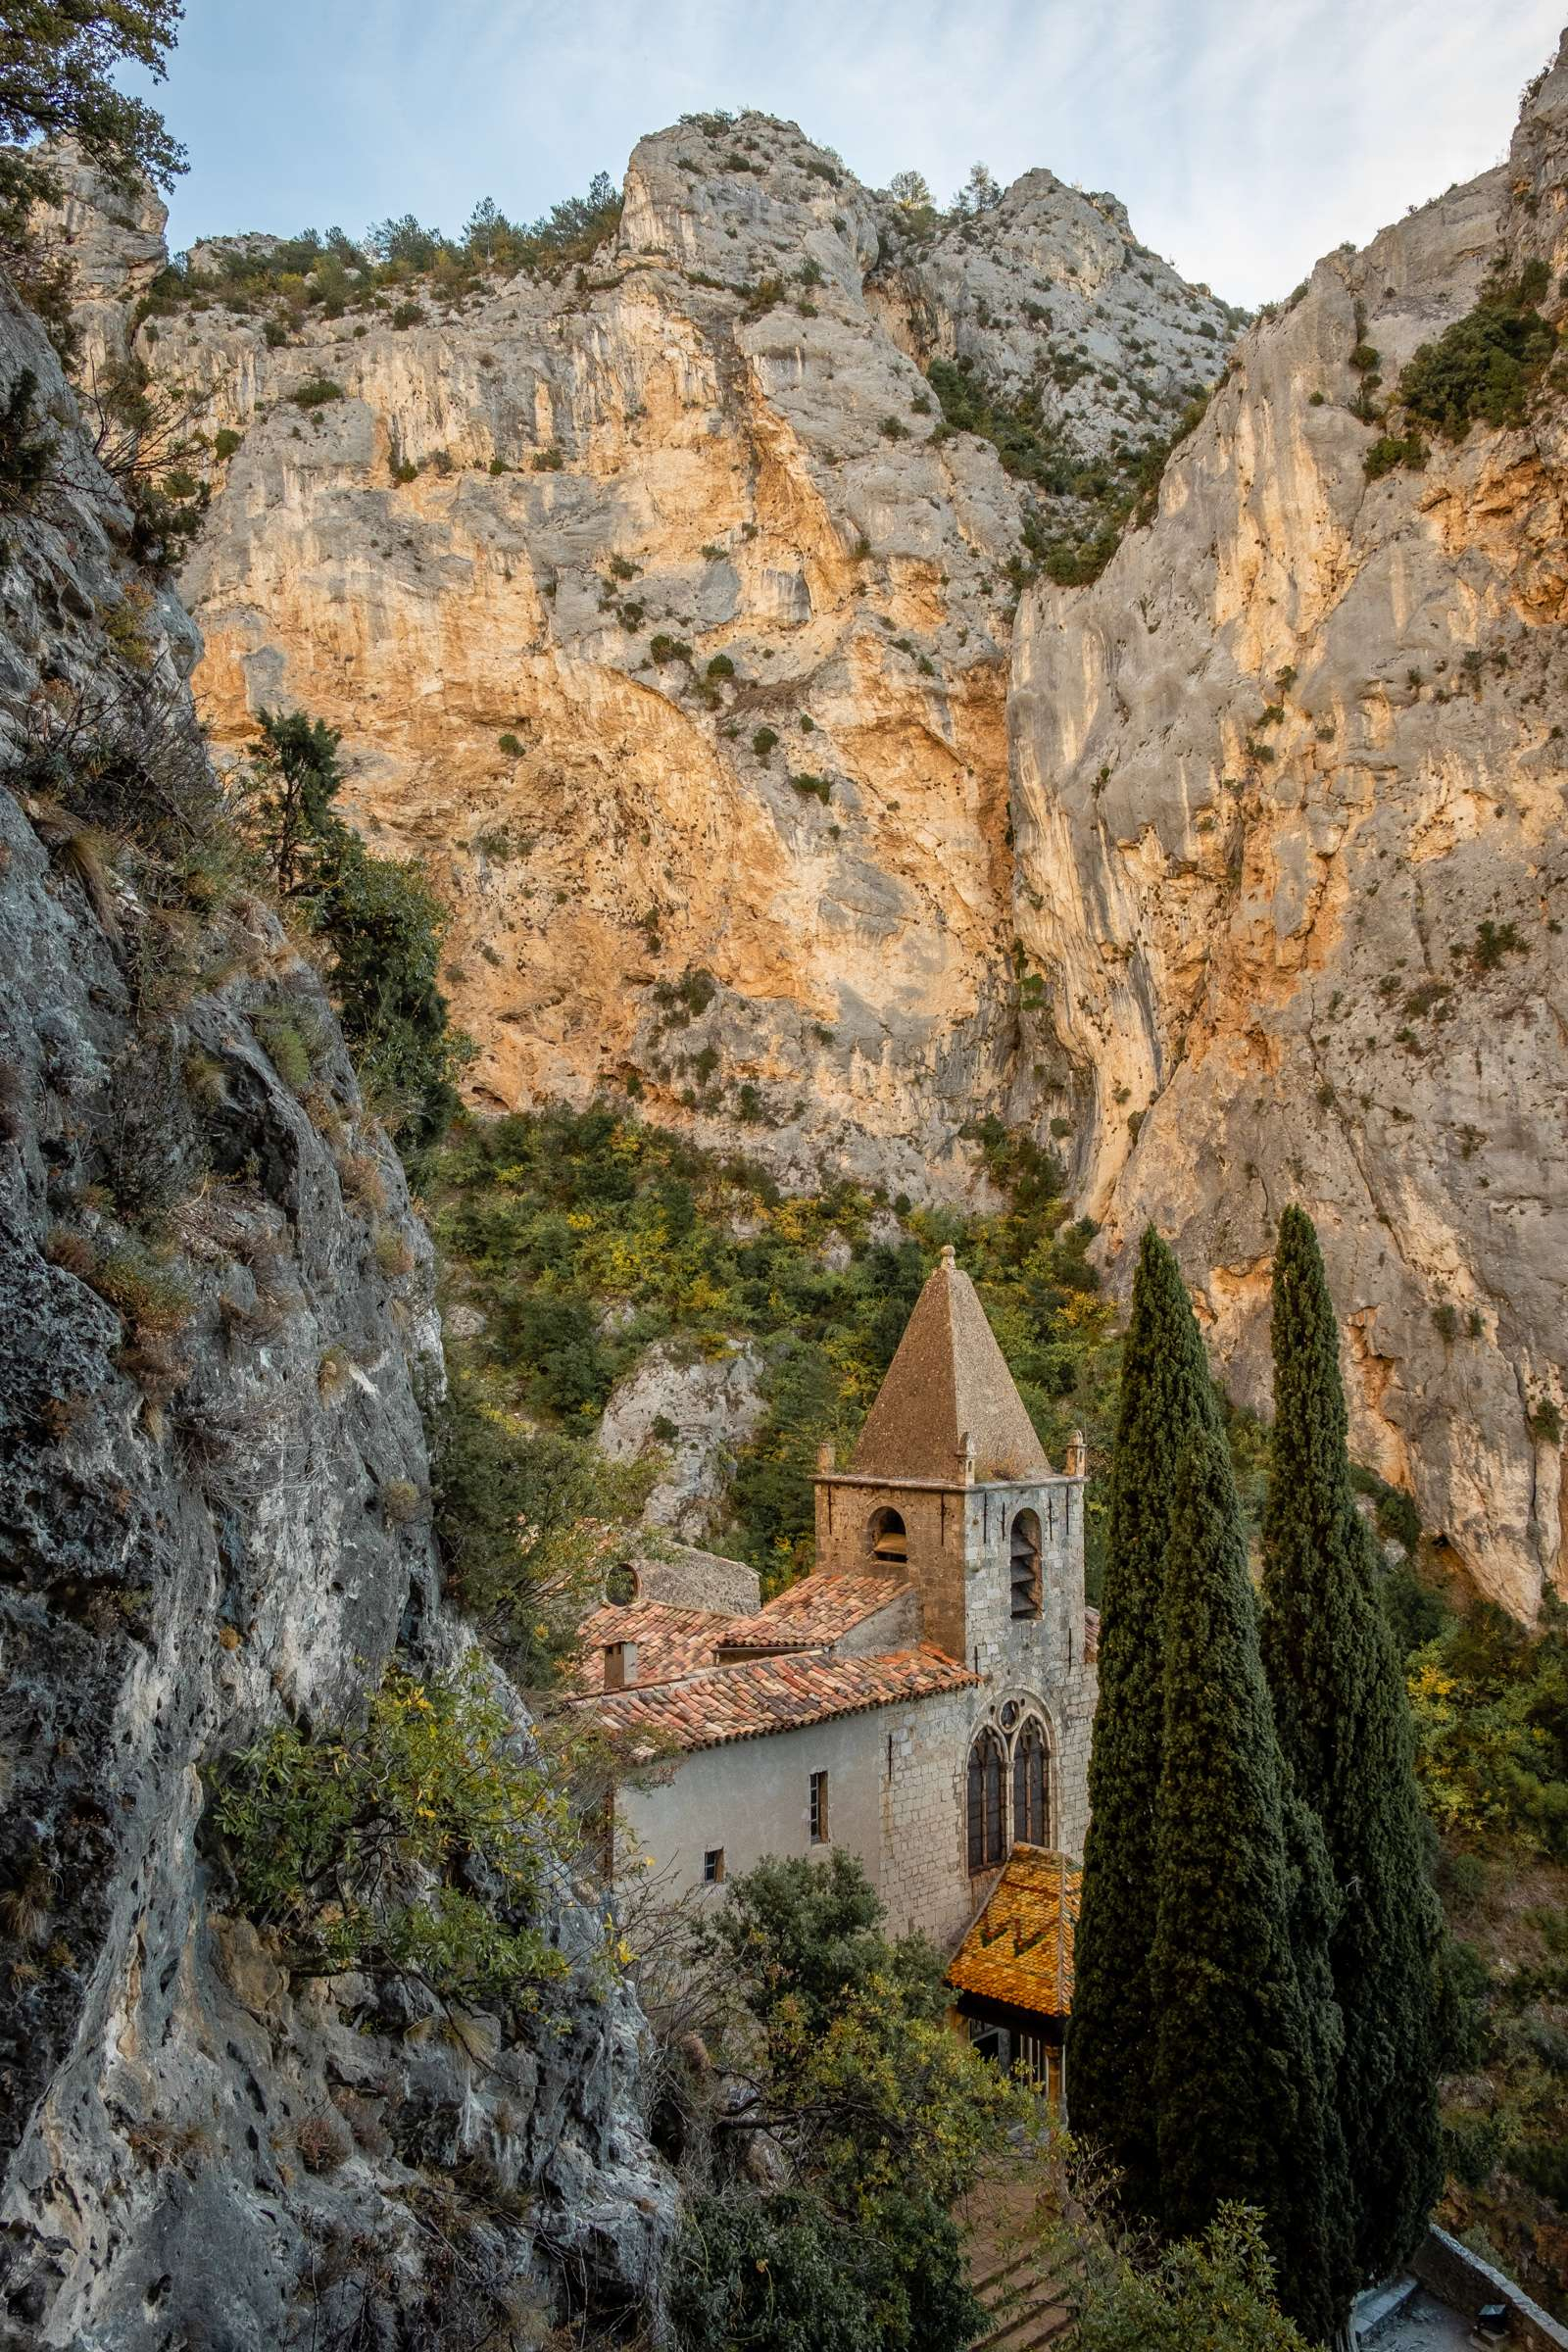 Notre-Dame de Beauvoir church nestled in gorge